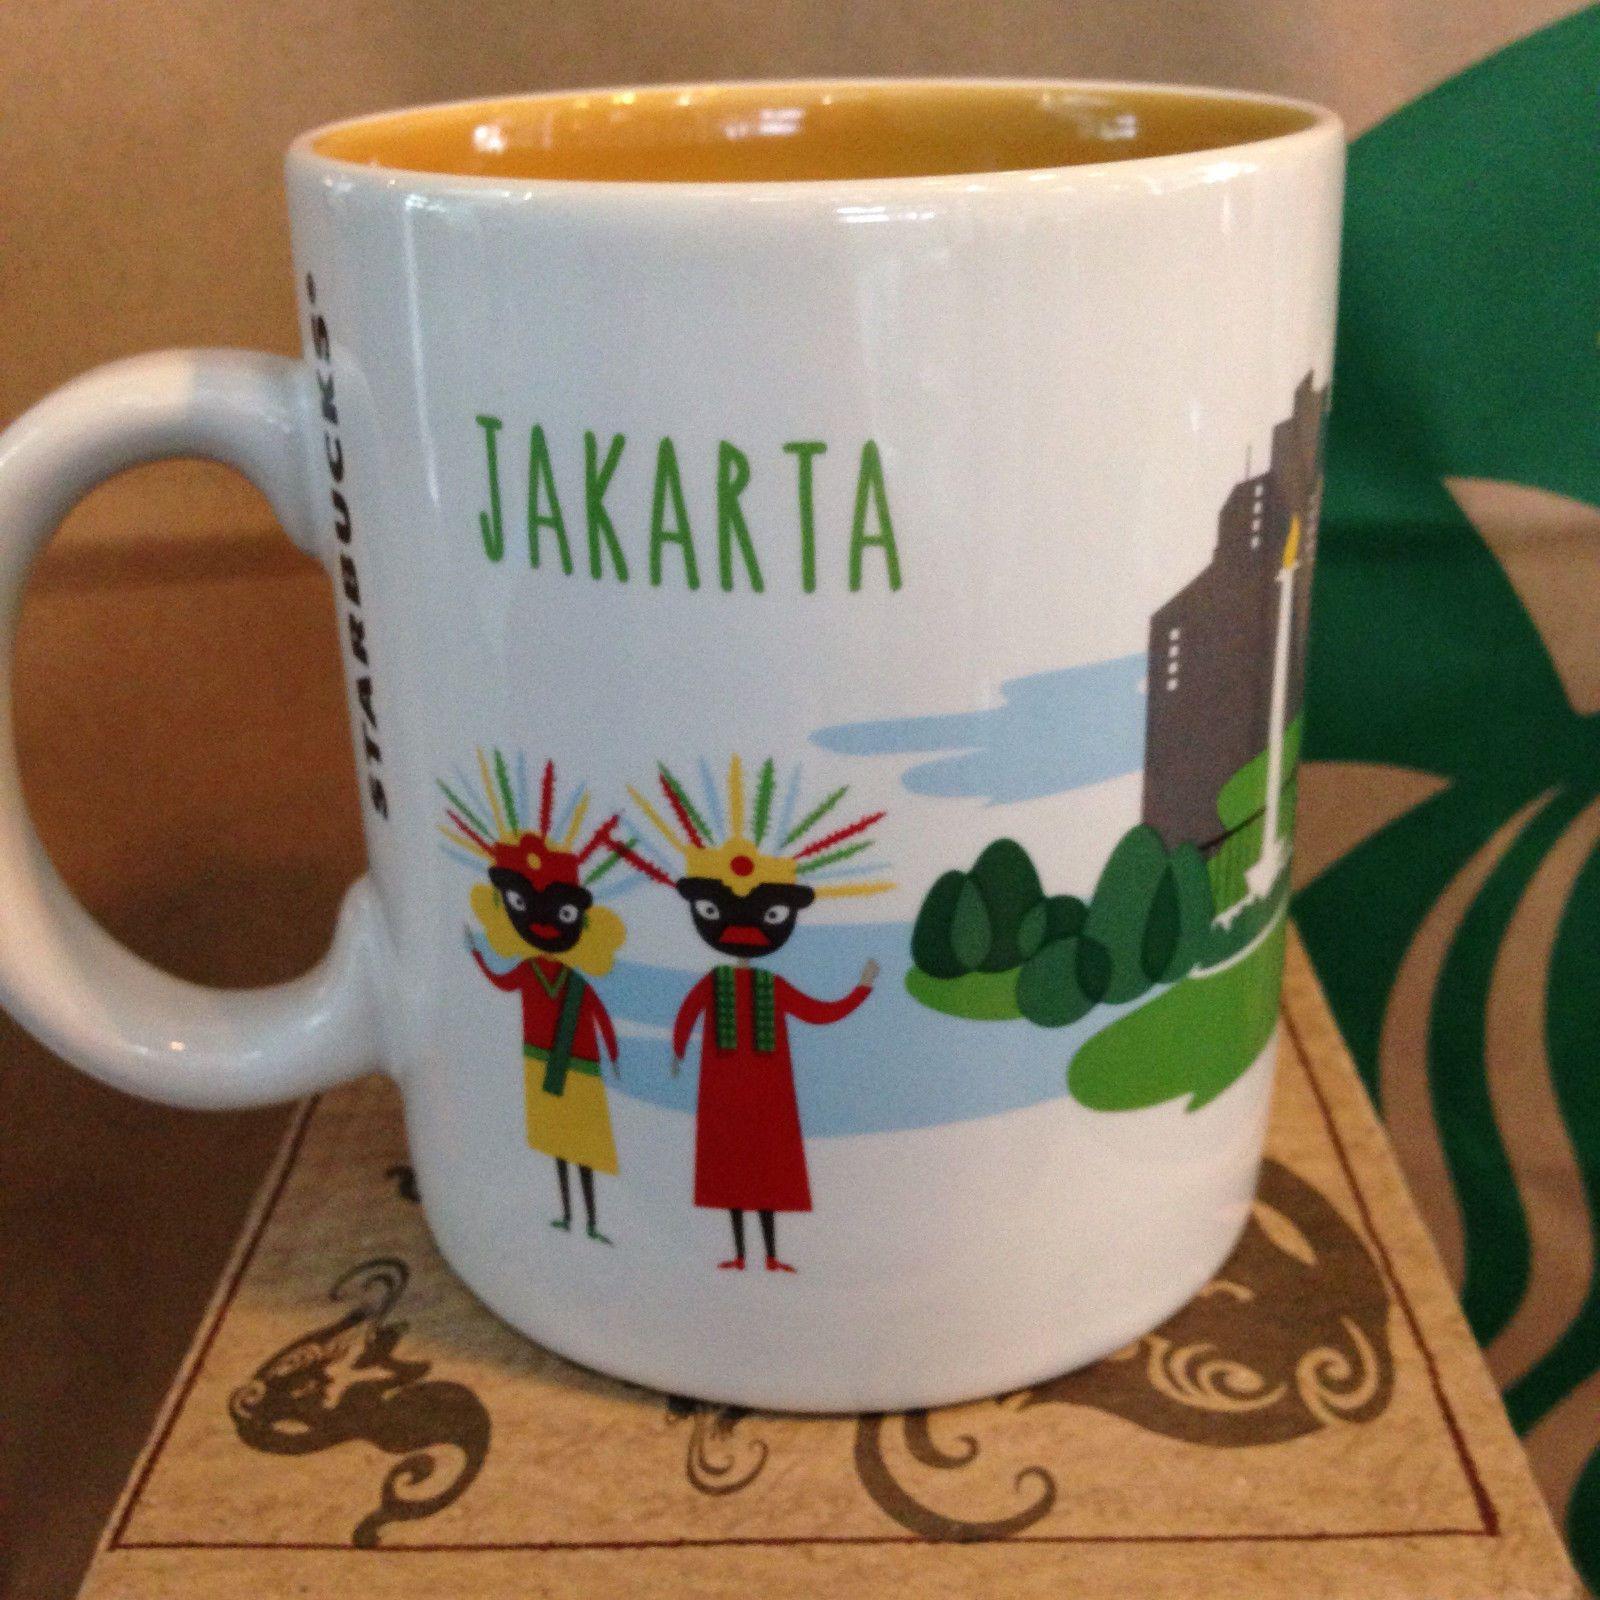 Starbucks Coffee Jakarta Indonesia New City Mug 16oz eBay